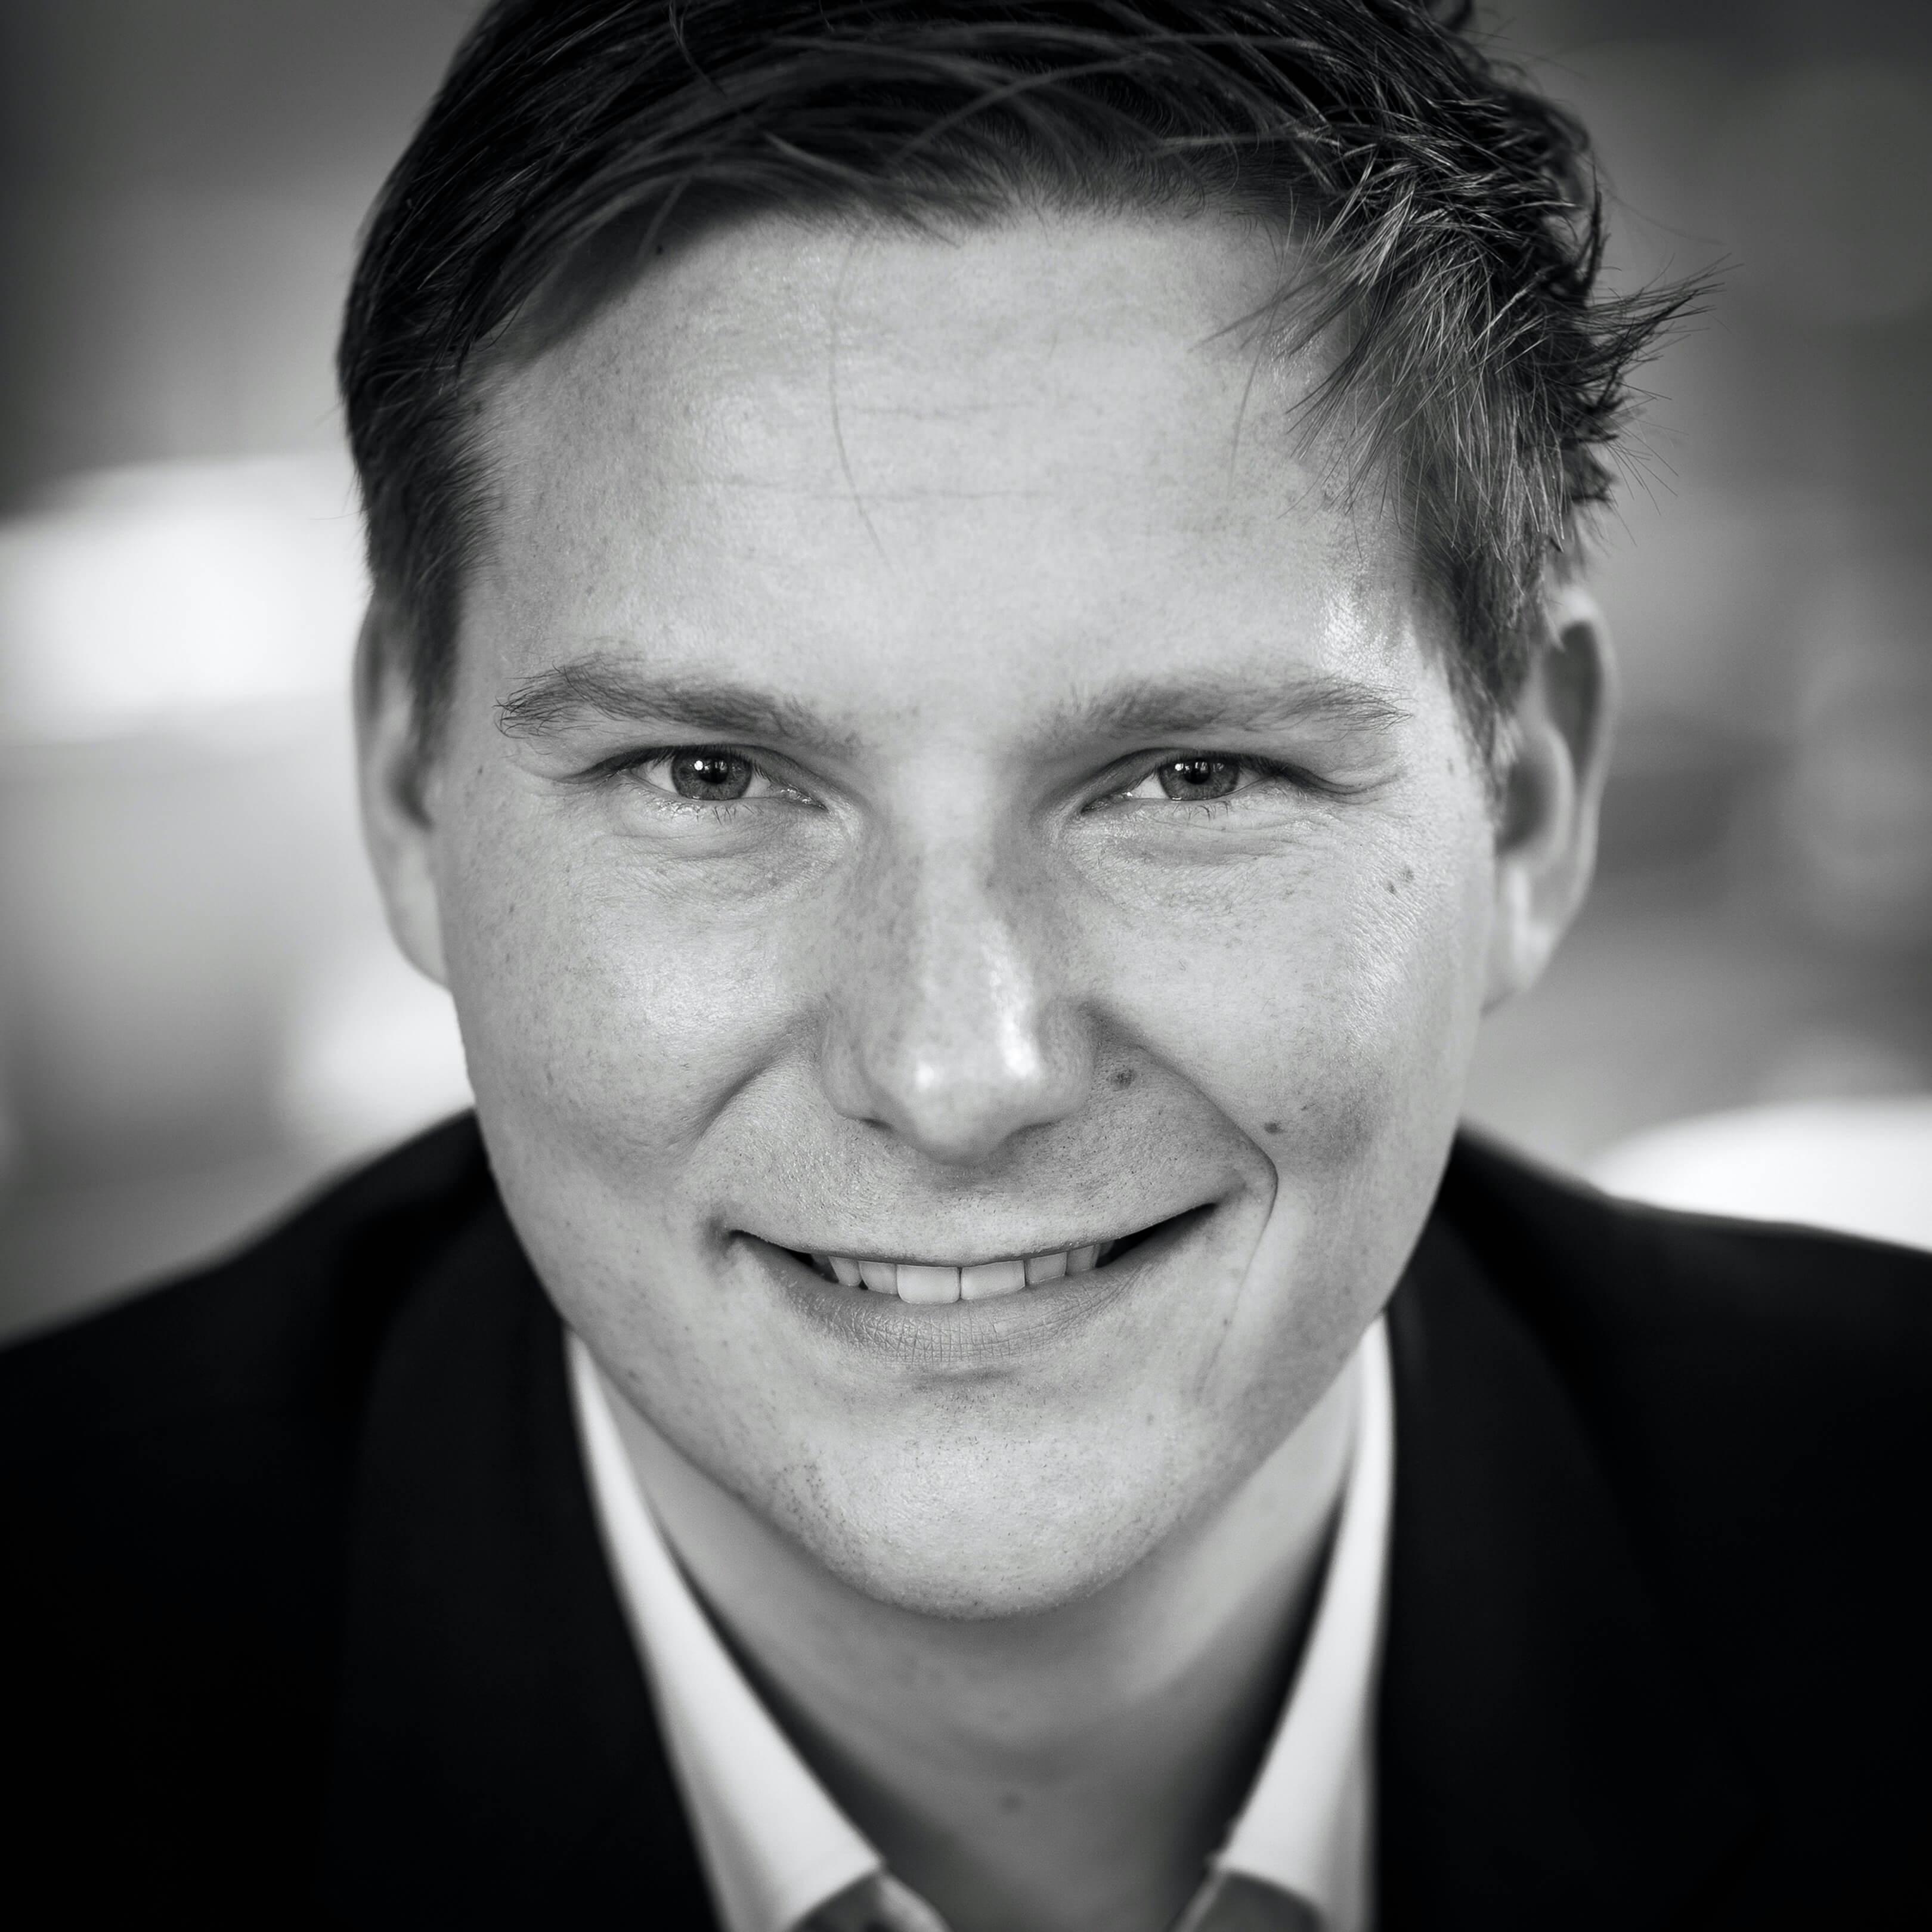 Sander van der Laan Supply Value portret Jurjen Poeles fotografie zwart wit